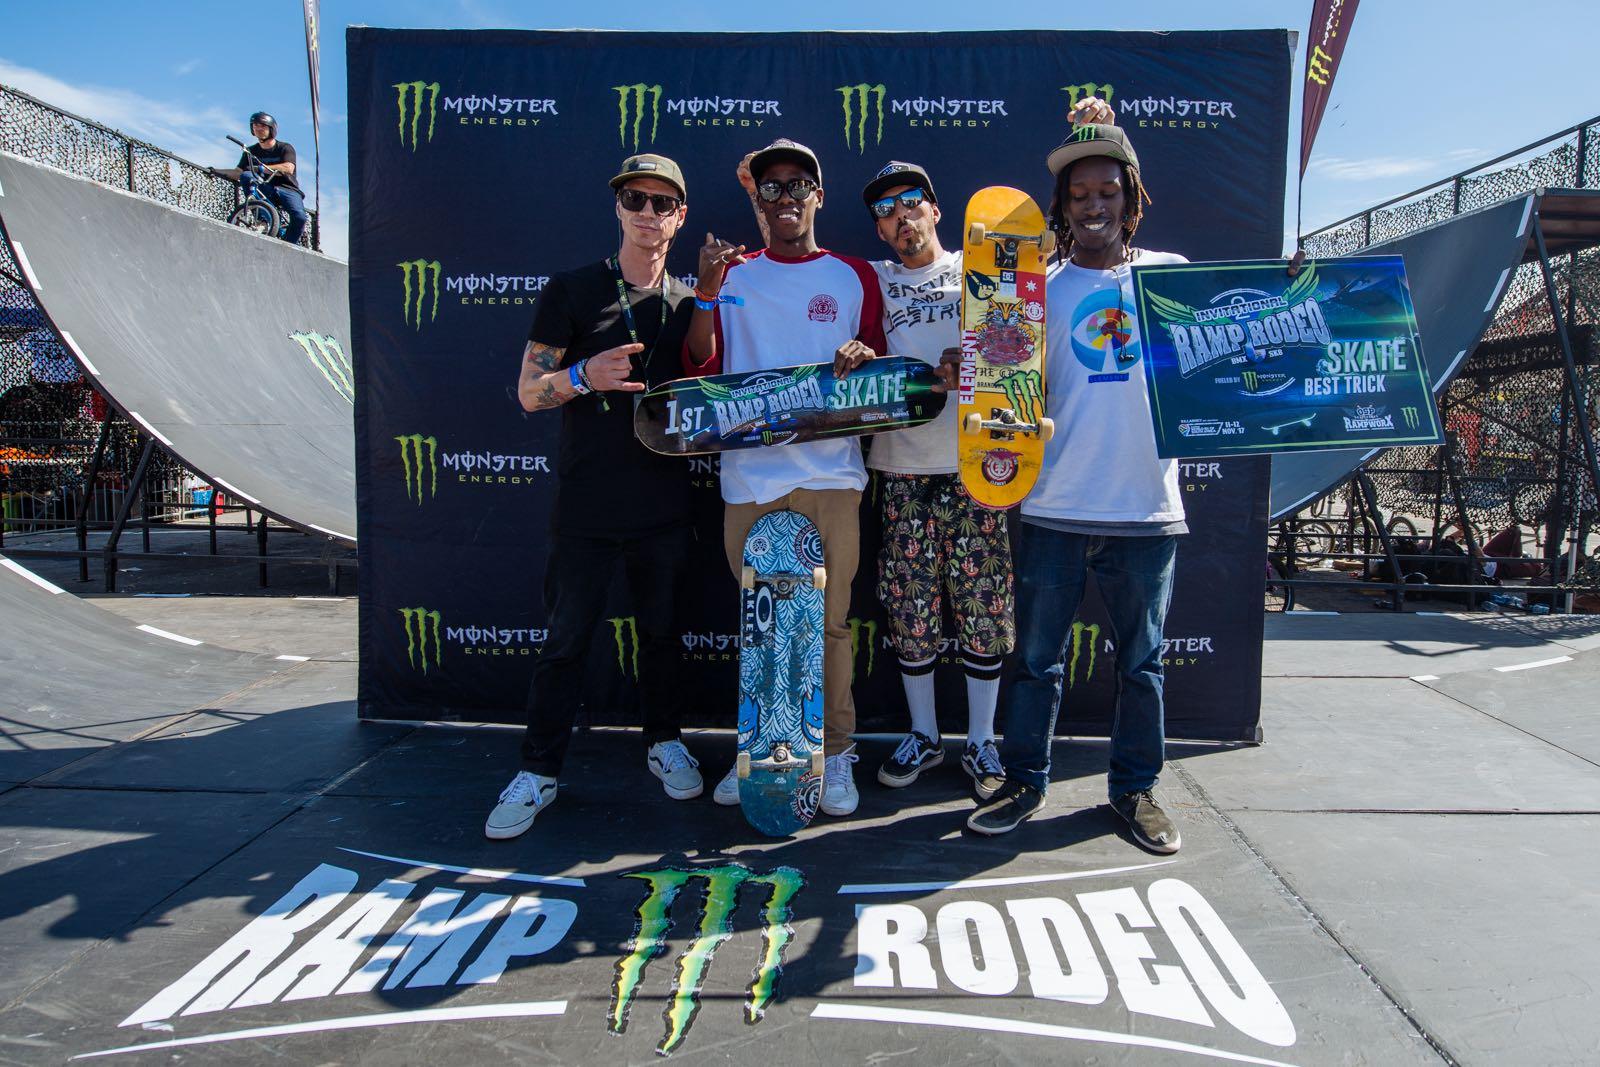 #RampRodeo 2 Skateboarding Podium